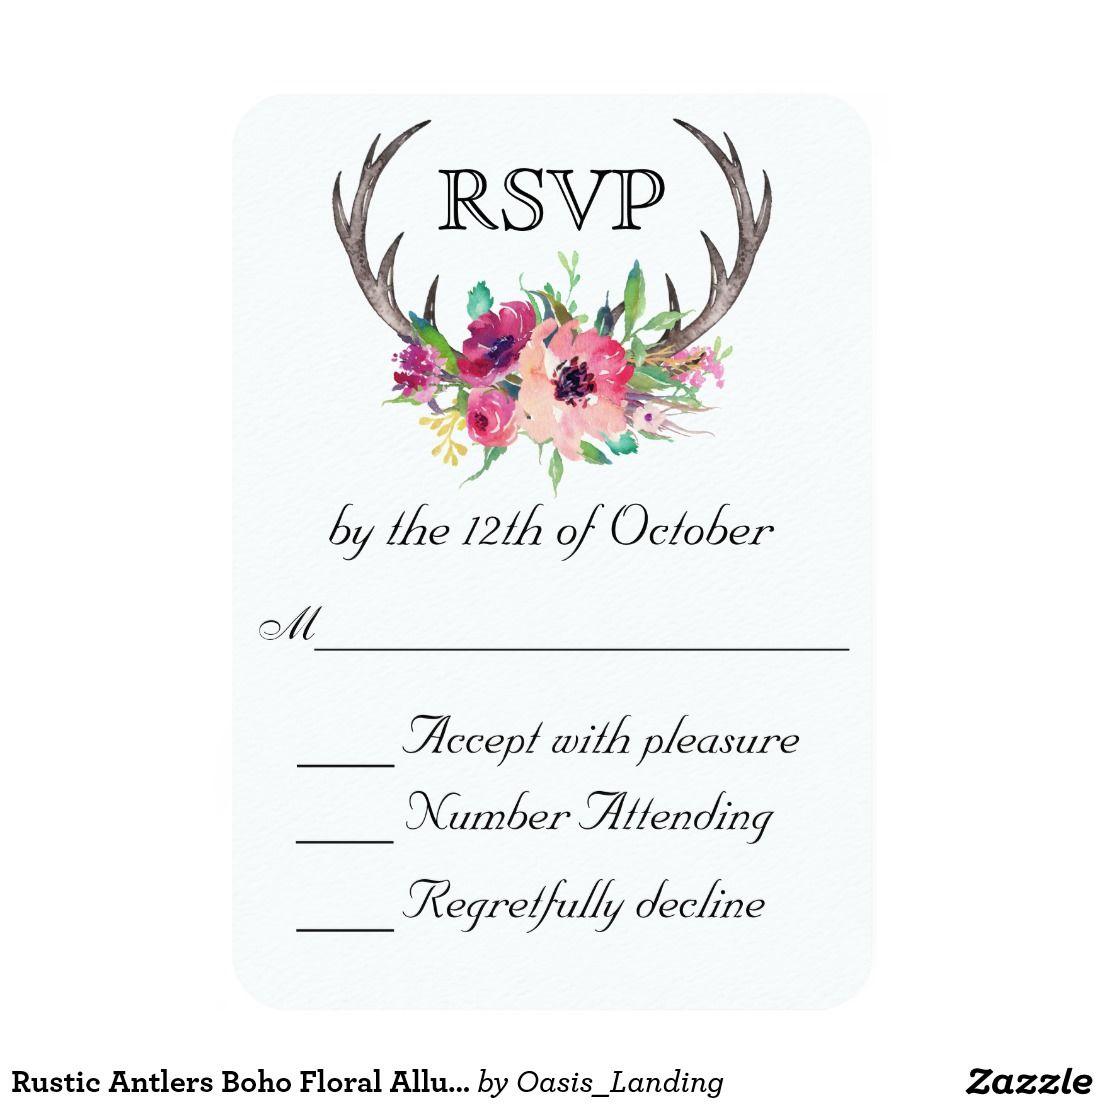 Rustic Antlers Boho Floral Allure Wedding Card Sold At